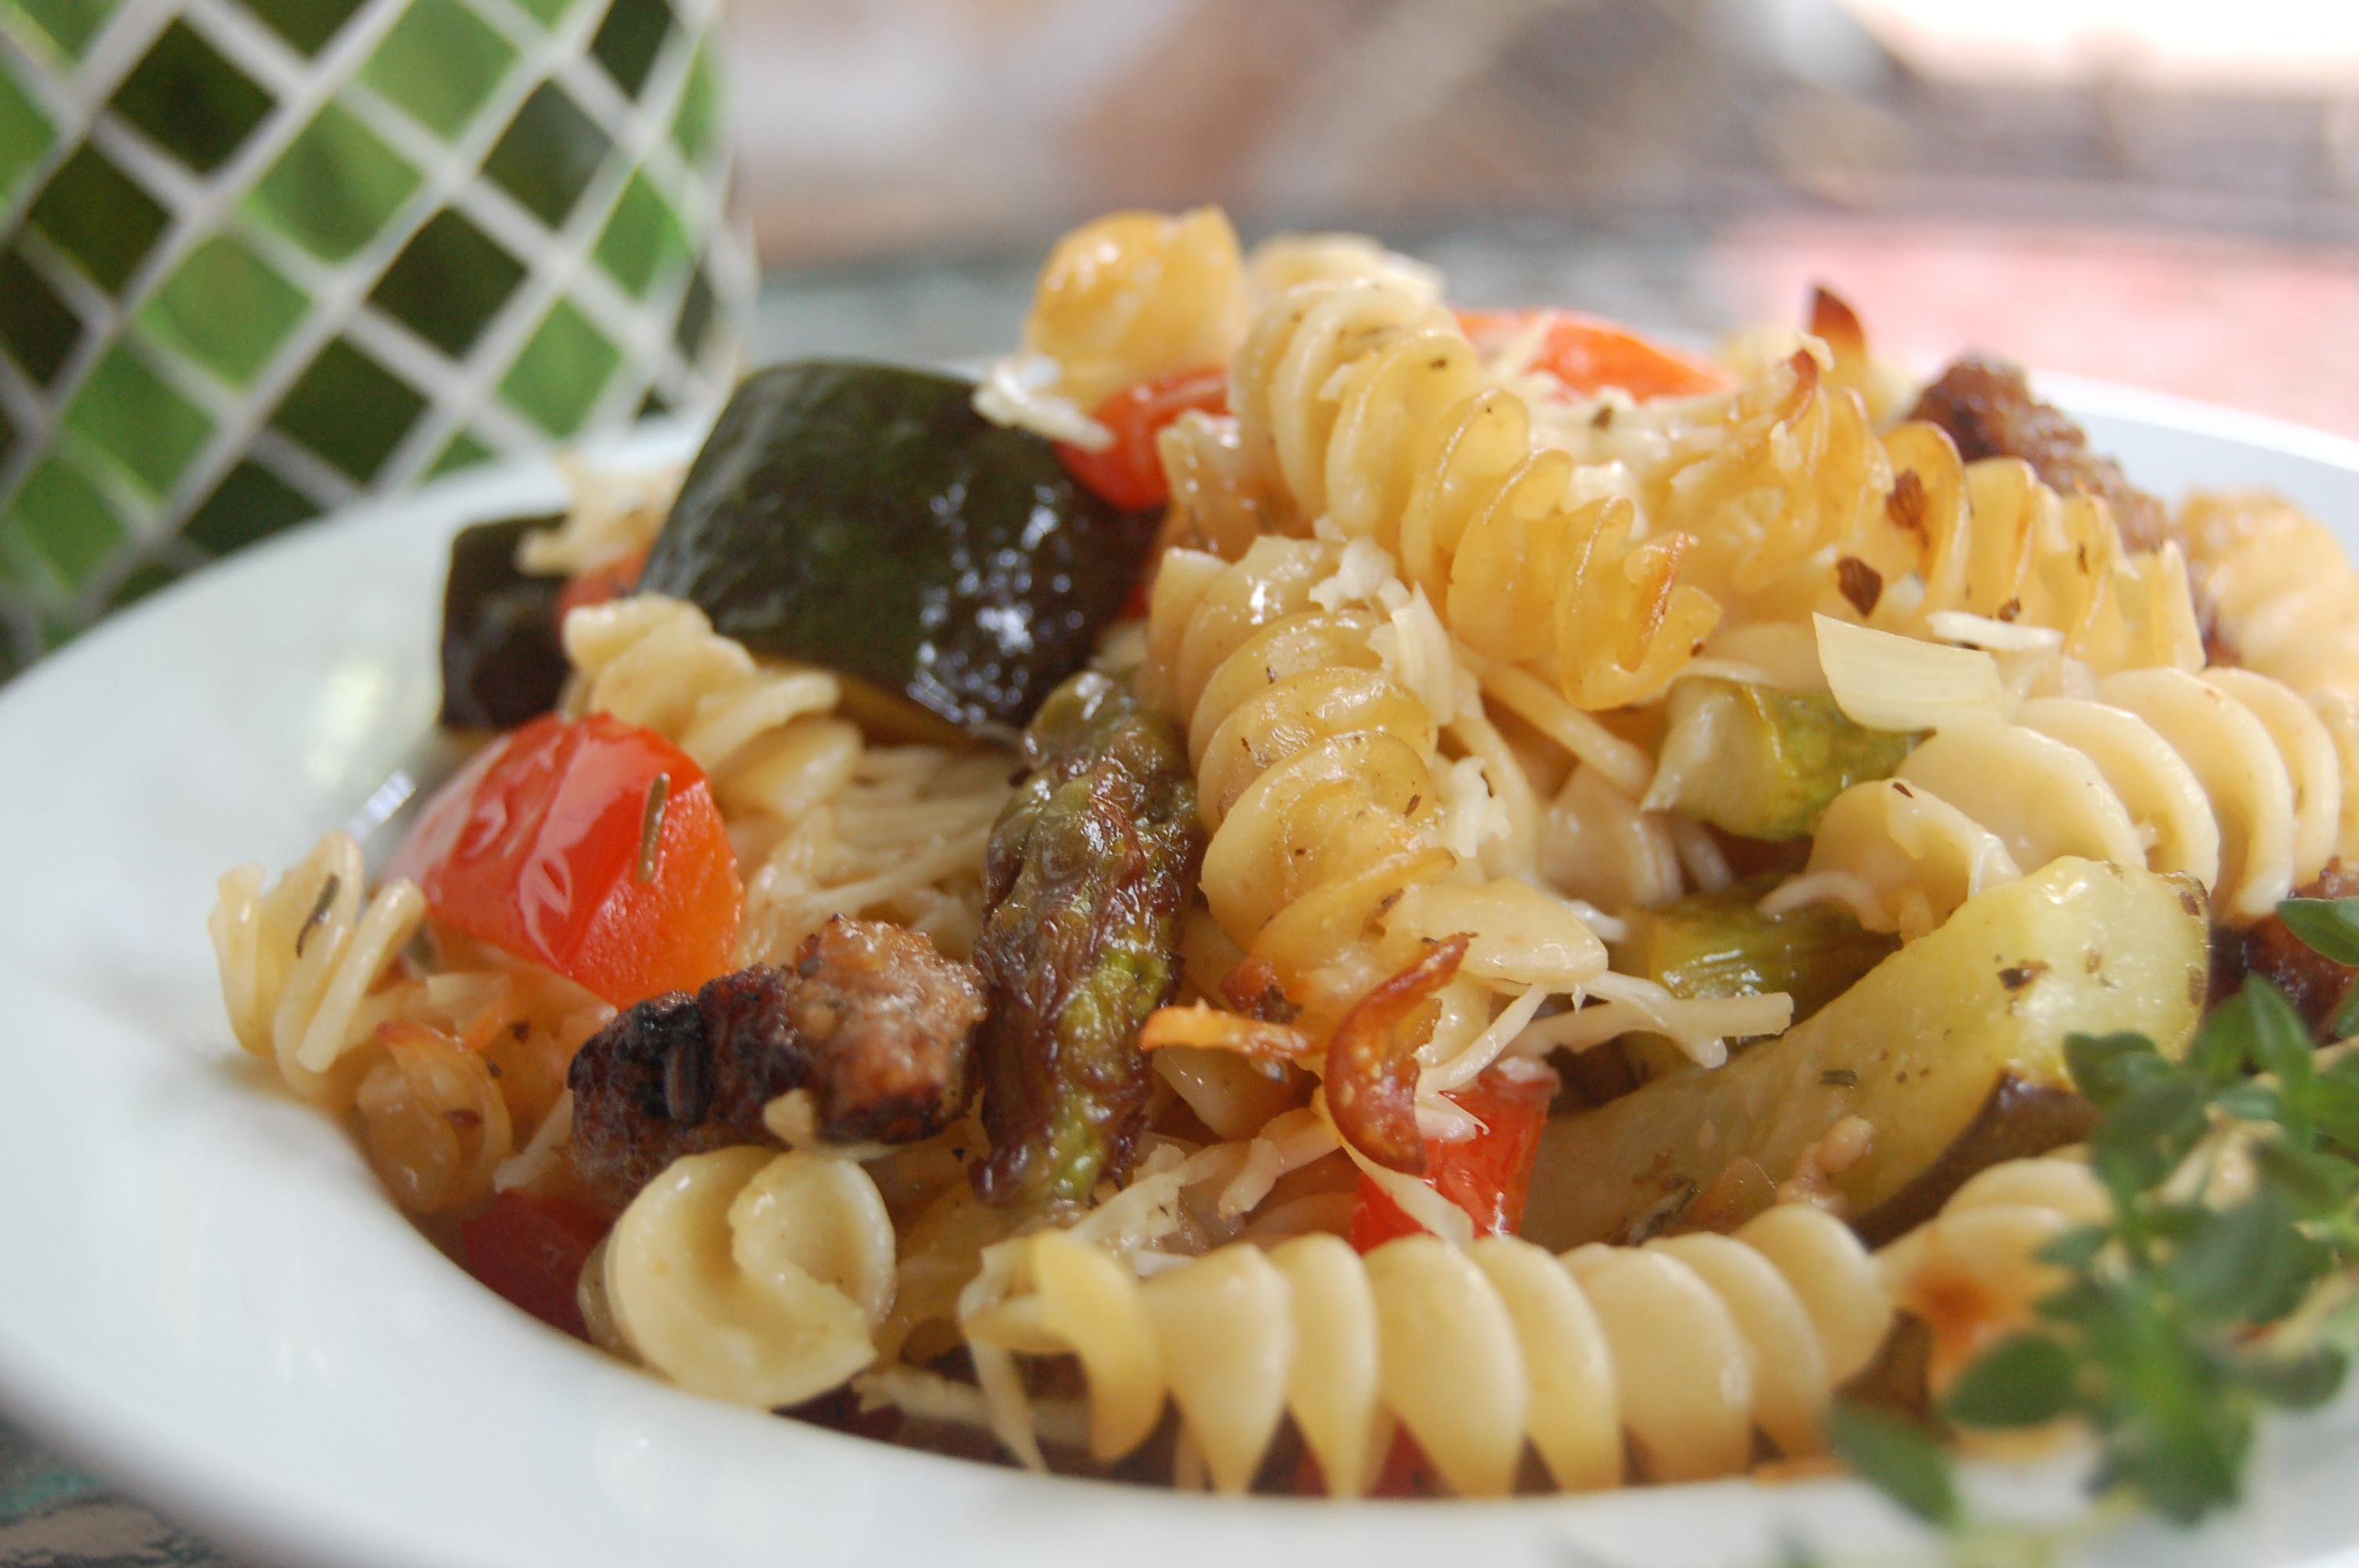 Garden Vegetable Pasta Bake | The Perfect Bite